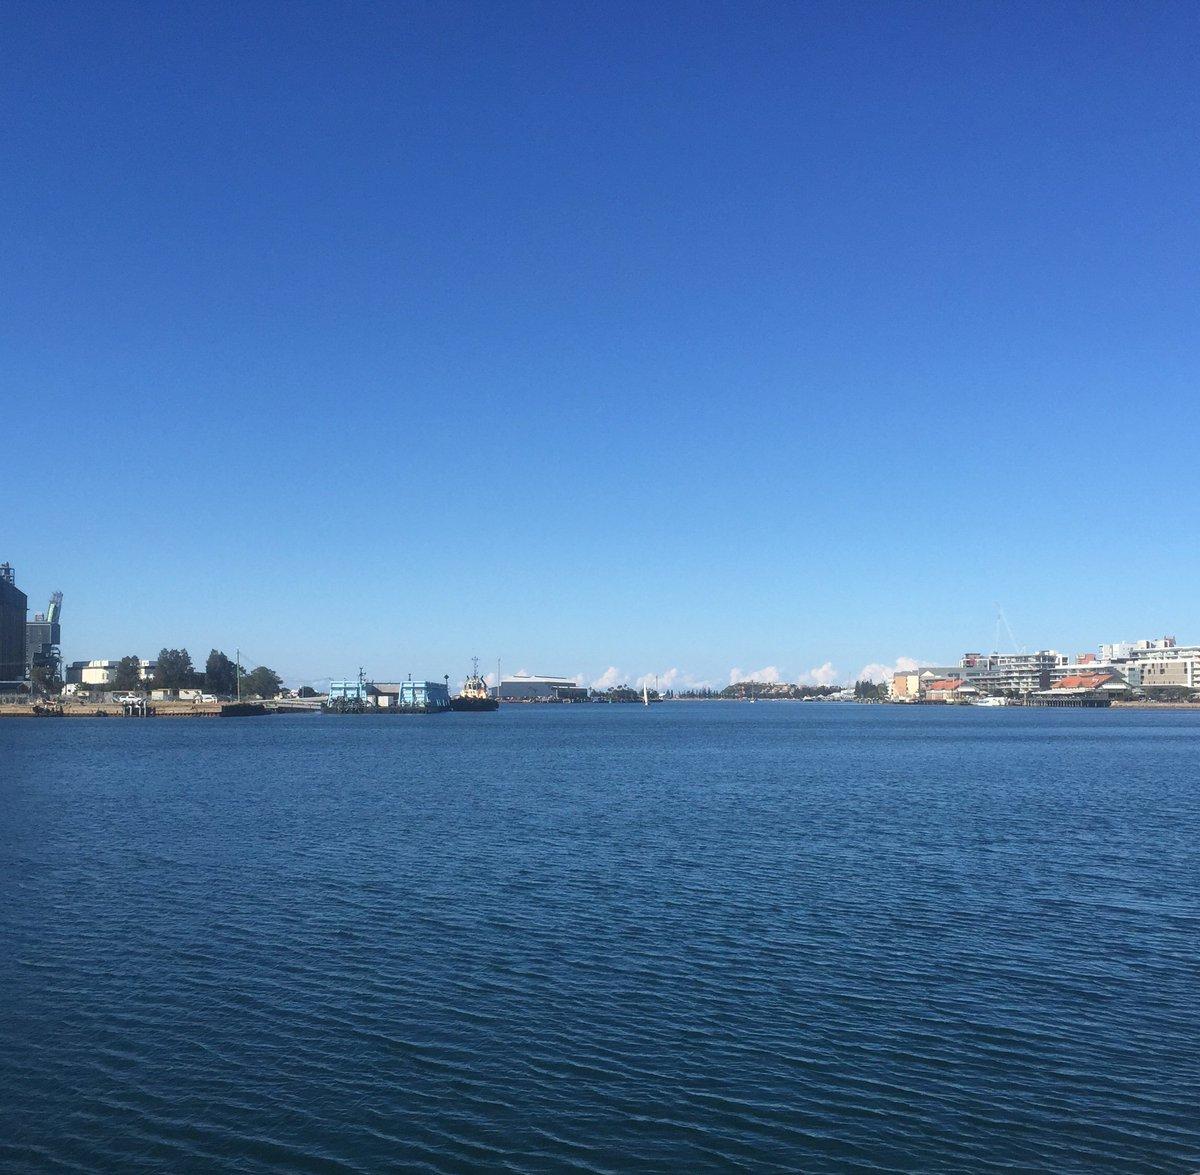 MTSNewcastle - Mission to Seafarers Newcastle Twitter